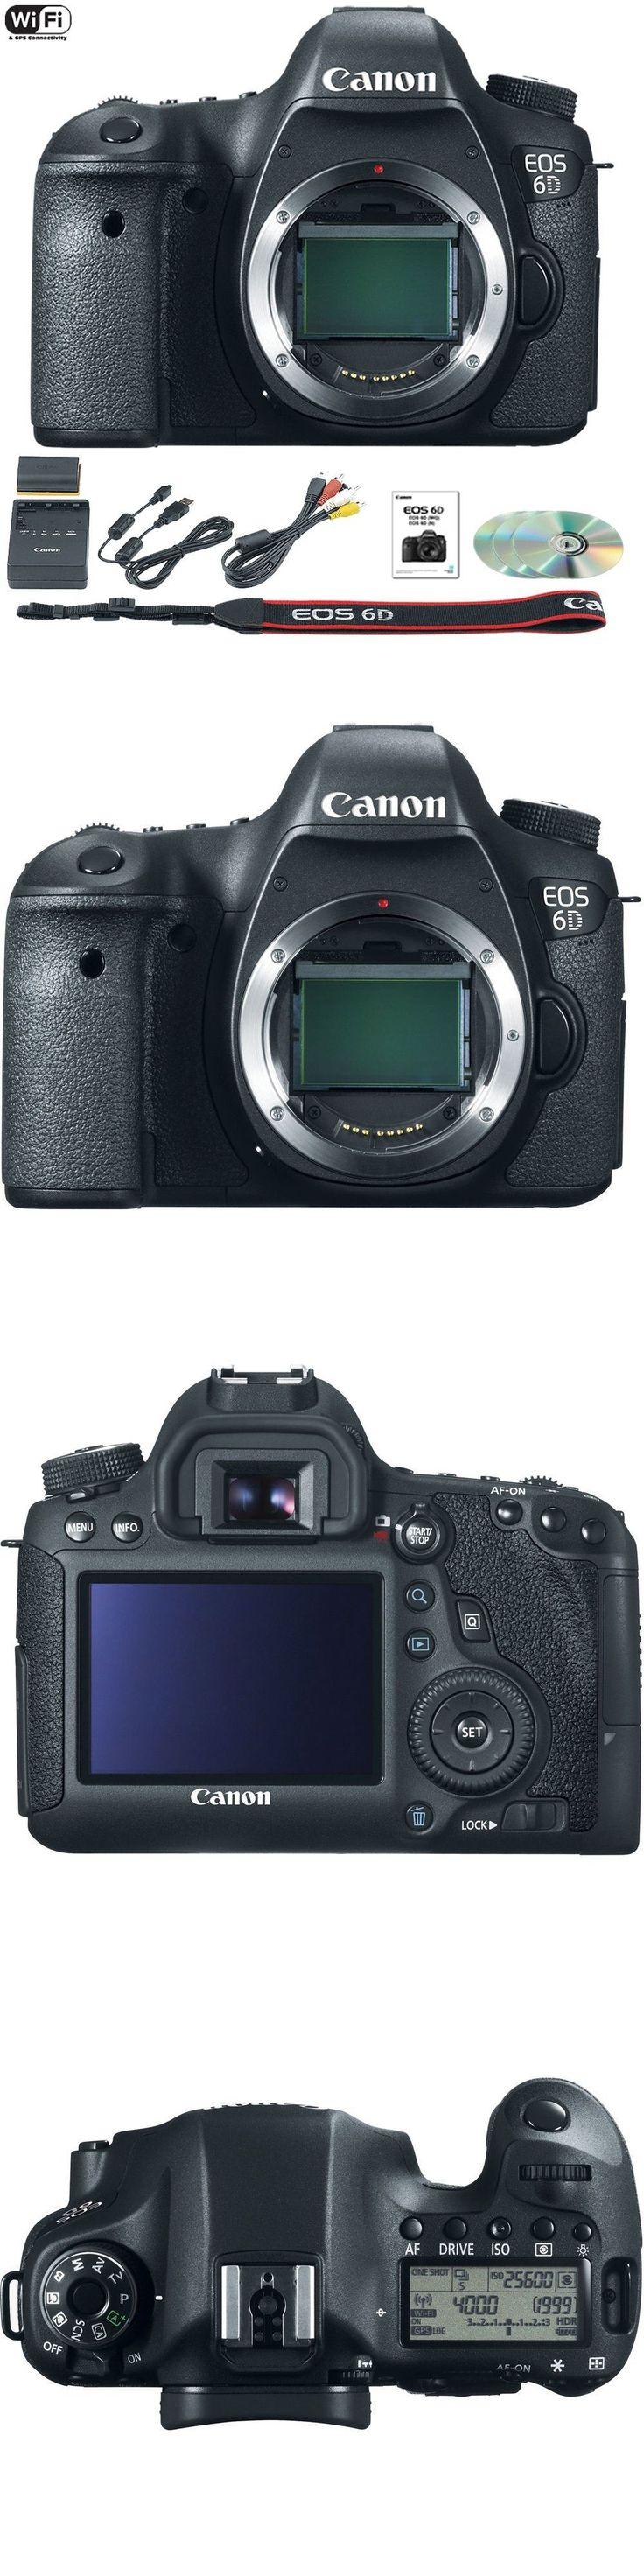 Camera Photo: Canon Eos 6D Mark Ii Mk 2 Digital Slr Camera (Body Only) -> BUY IT NOW ONLY: $1949.99 on eBay!